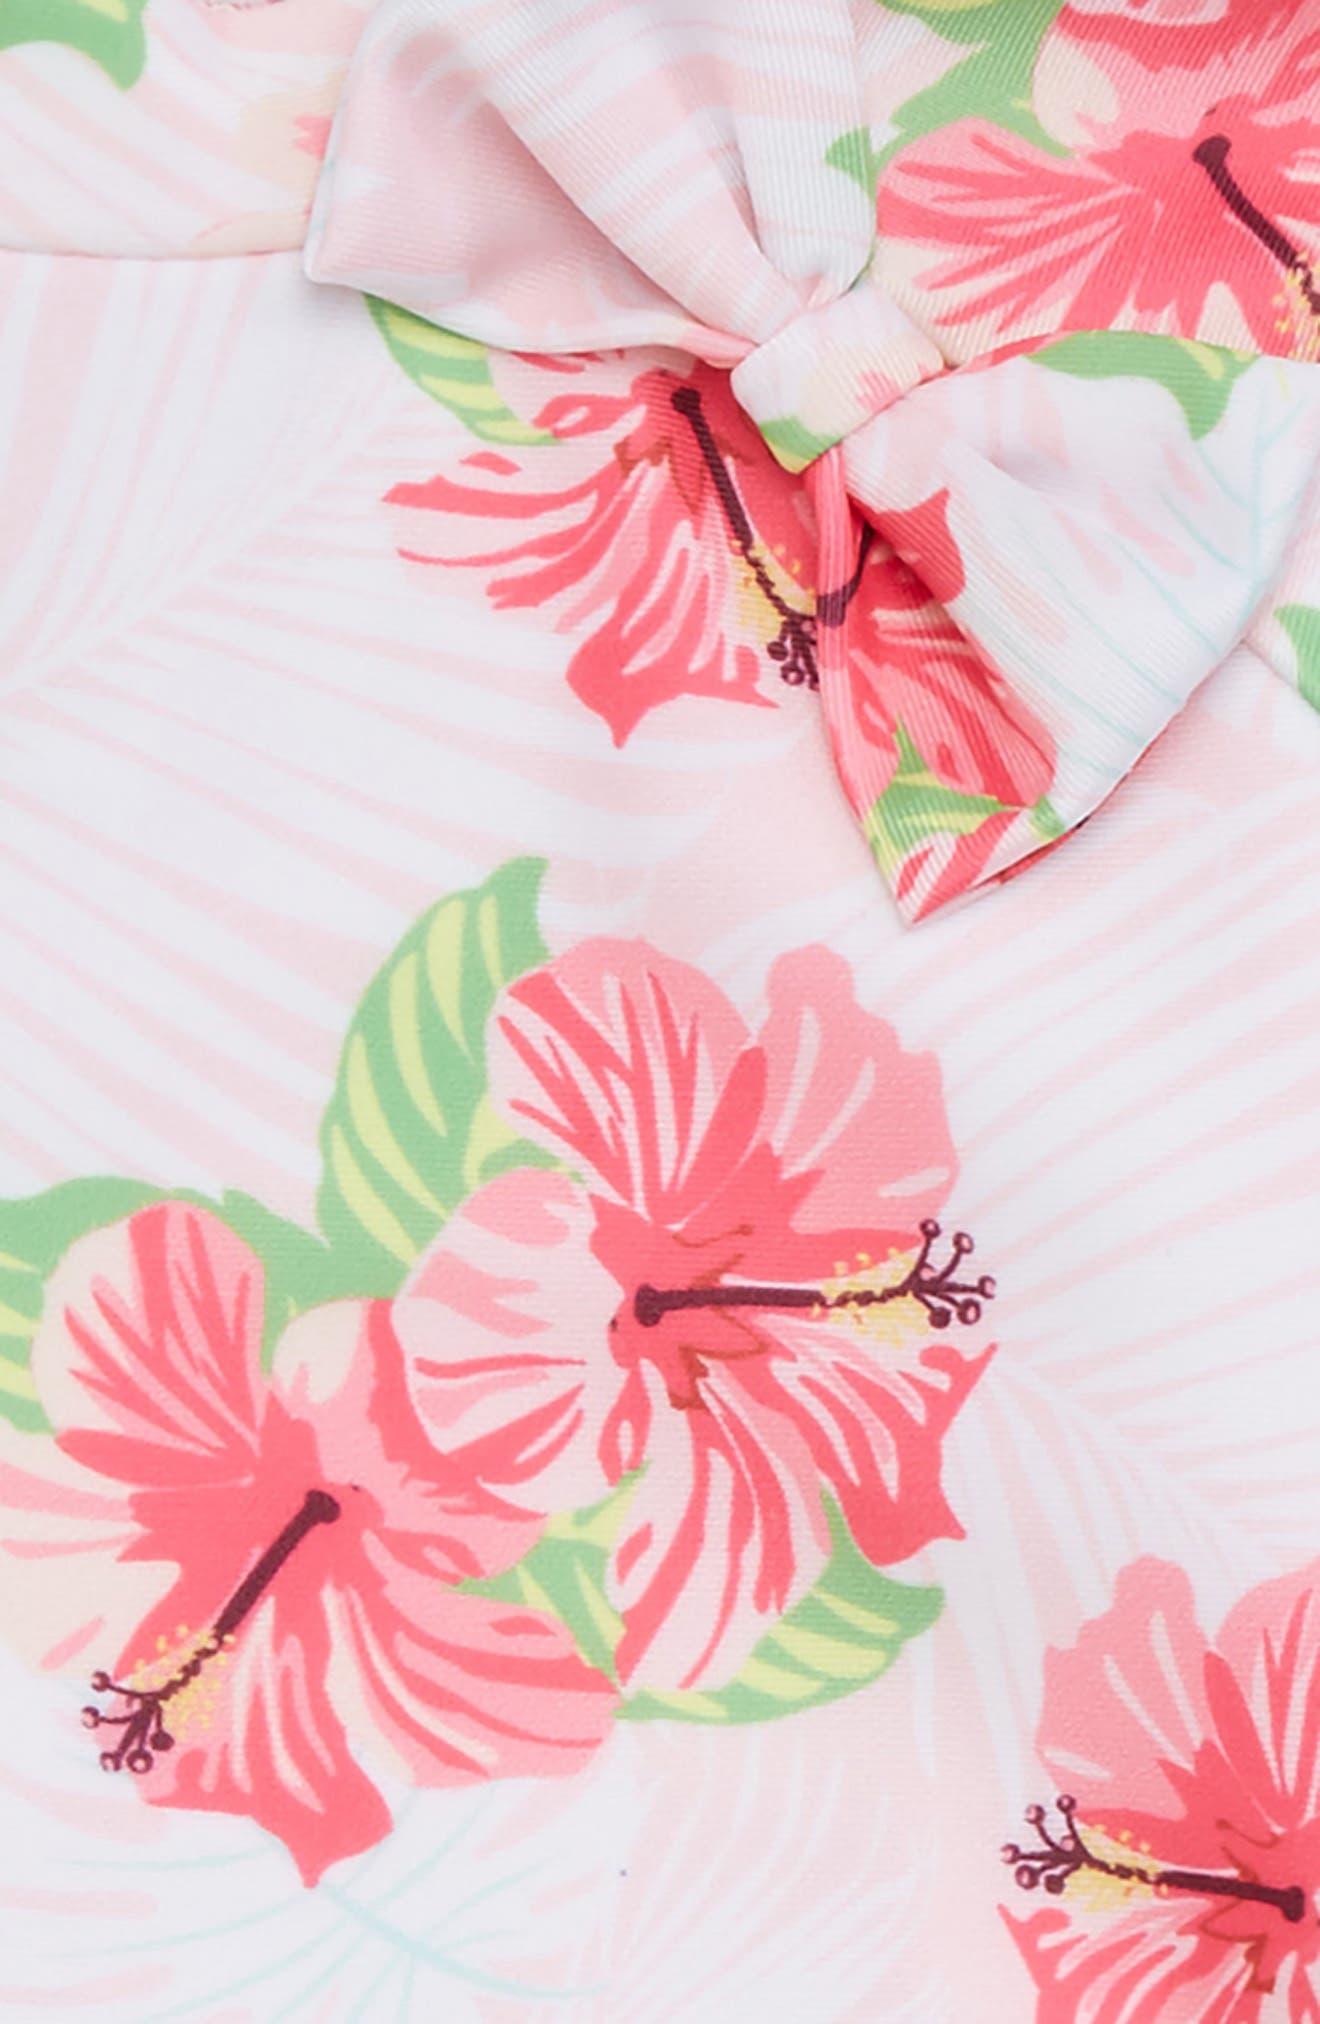 Hibiscus Splash Two-Piece Rashguard Swimsuit,                             Alternate thumbnail 2, color,                             699